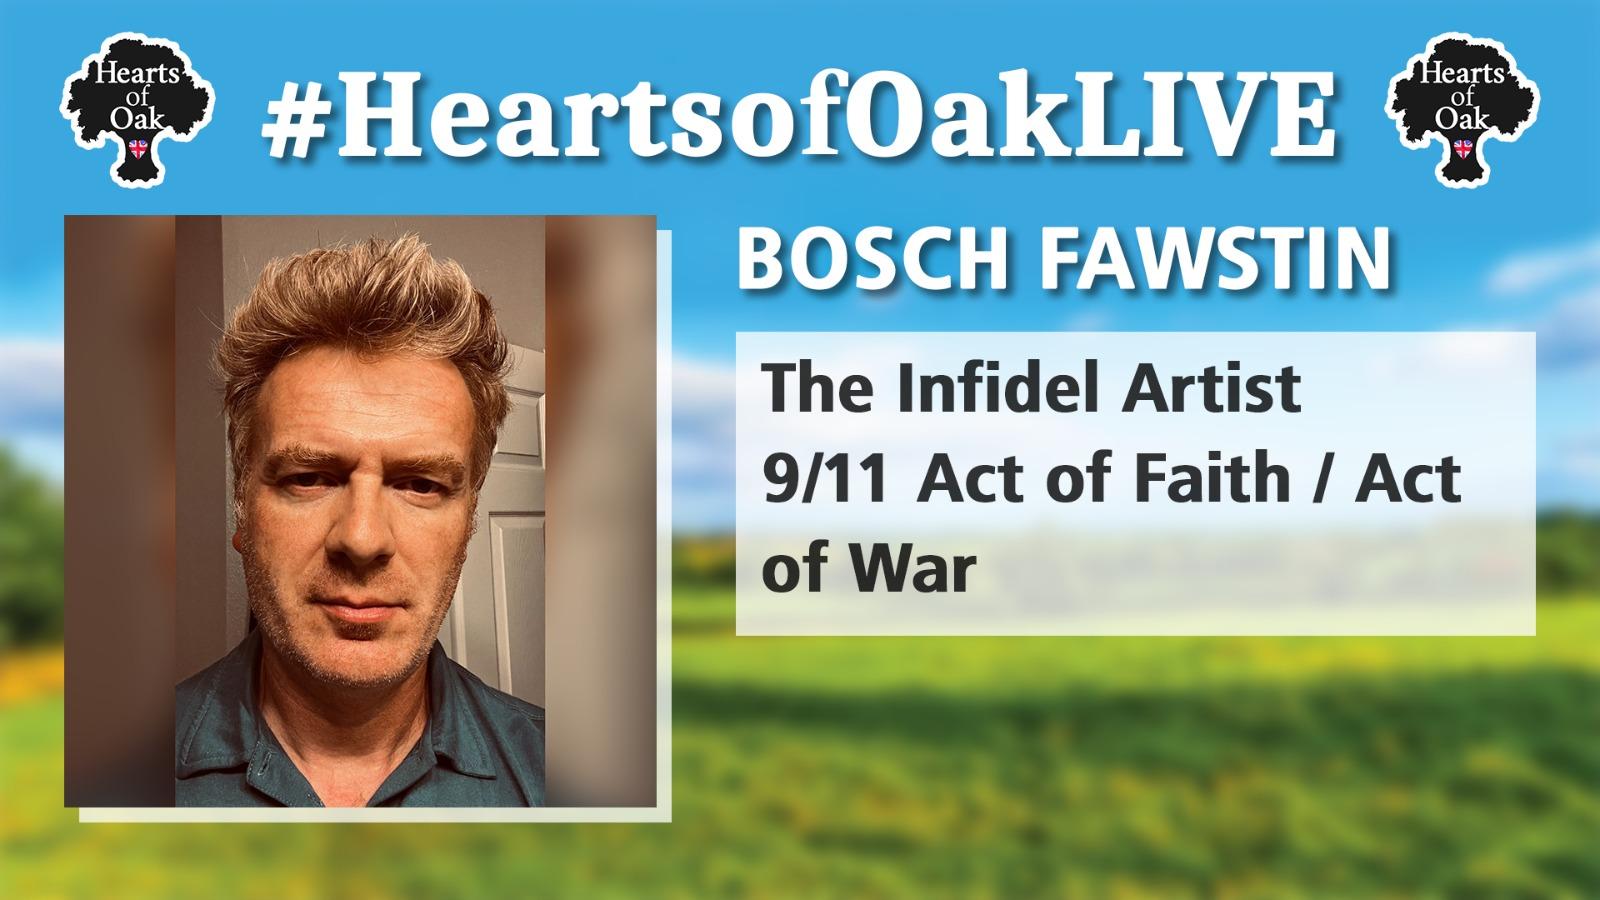 Bosch Fawstin: The Infidel Artist - 9/11 Act of Faith/Act of War